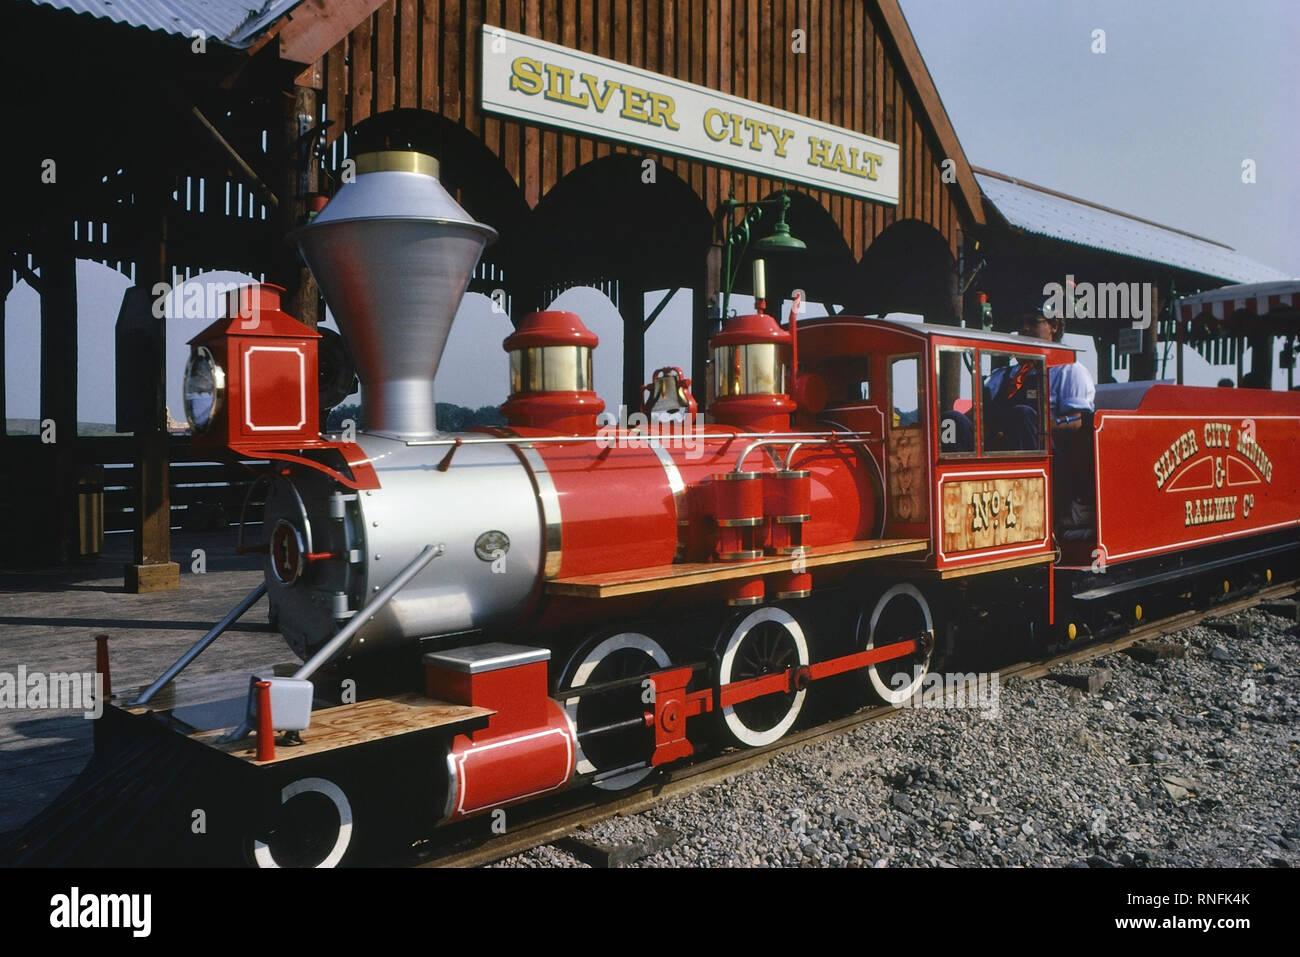 The Santa Fe Railroad At The American Adventure Theme Park Ilkeston Derbyshire England Uk Circa 1980 S Stock Photo Alamy